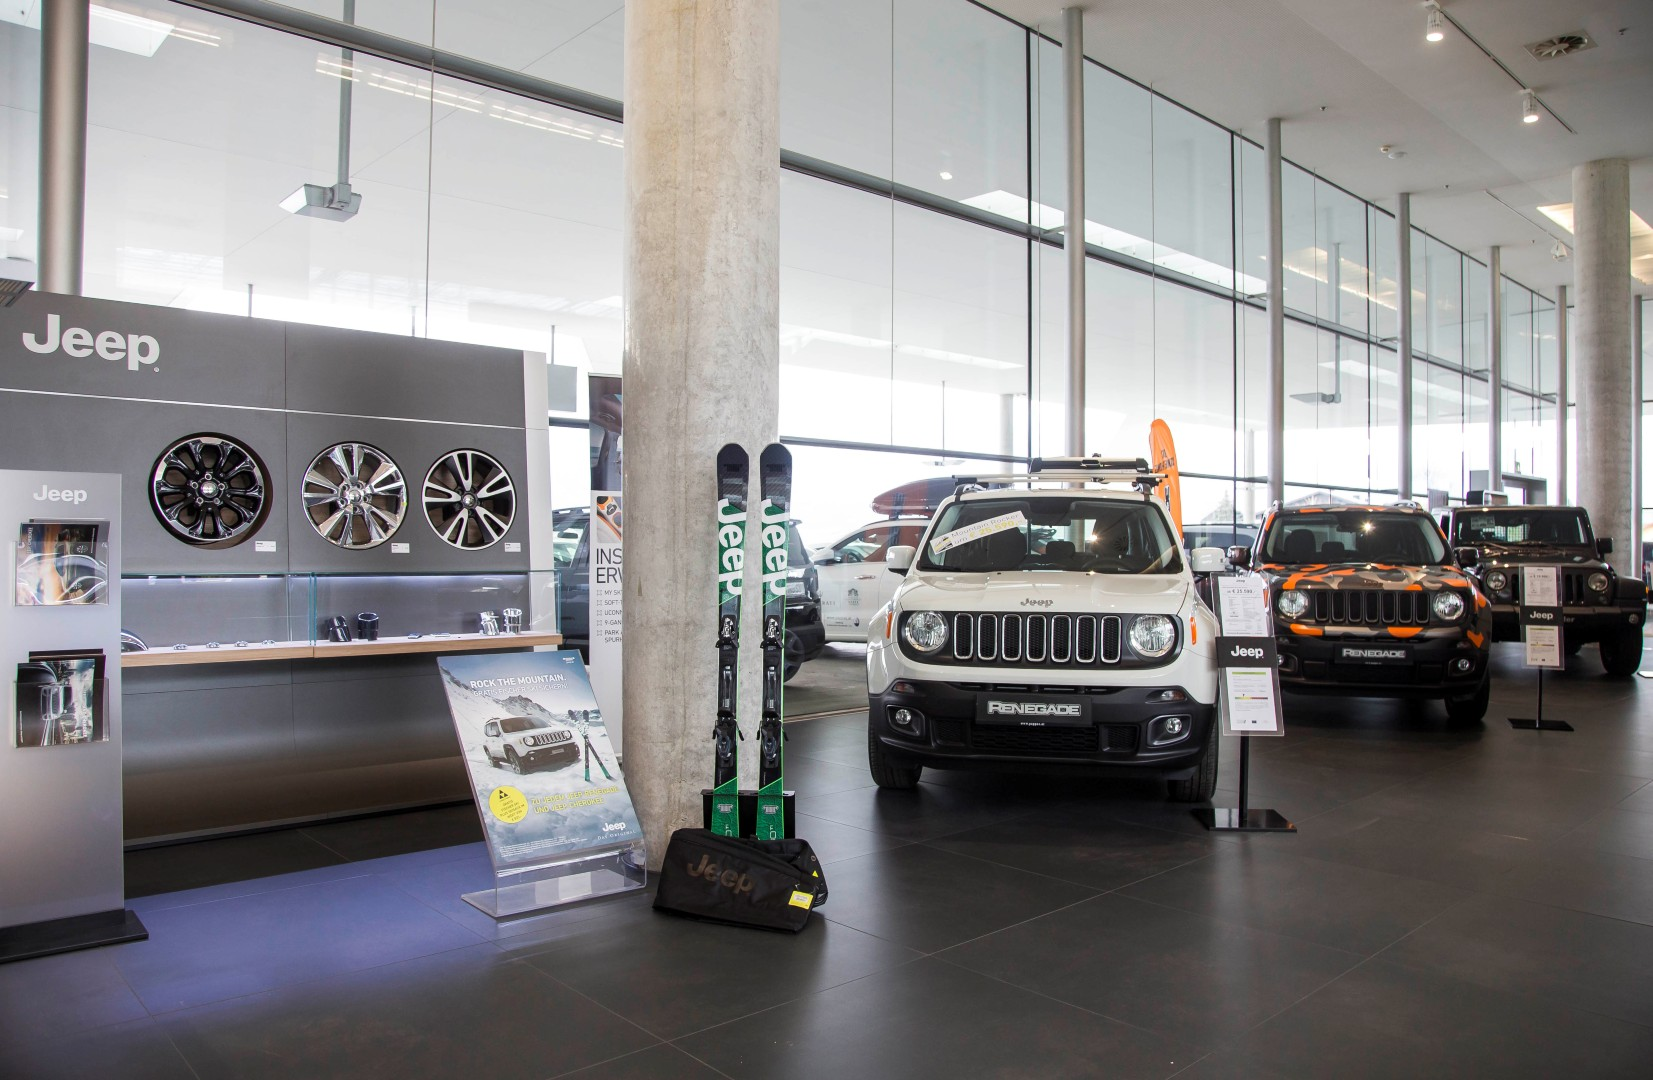 Georg Pappas Automobil GmbH